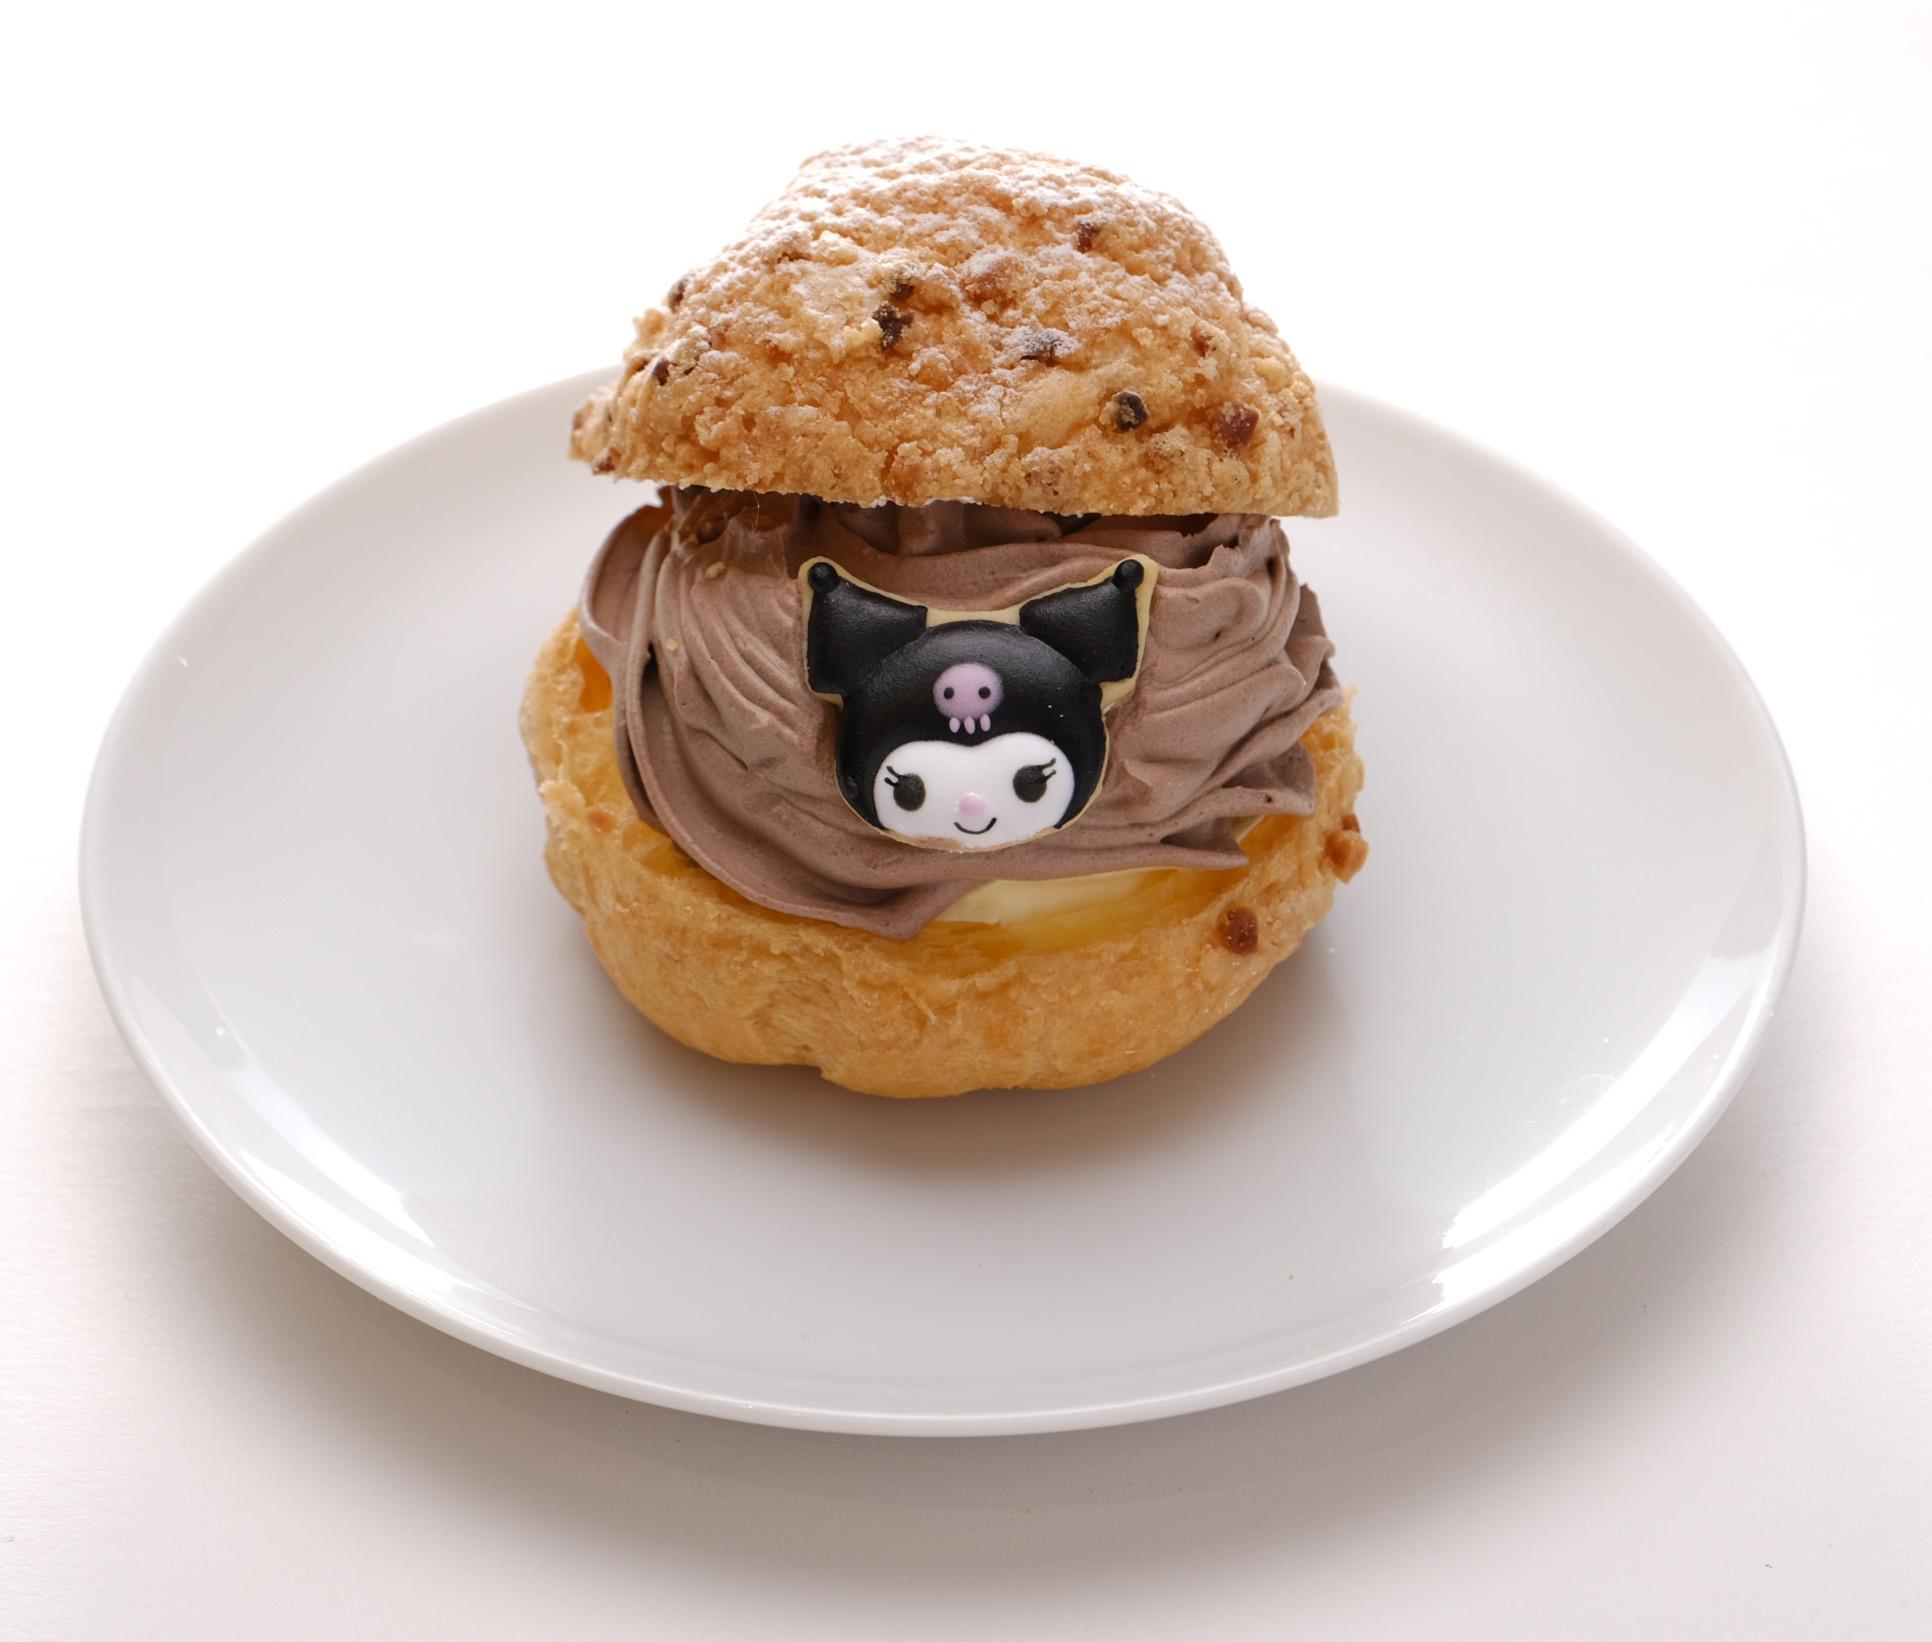 「Hello Kitty Japan ダイバーシティ東京 プラザ店」カフェ_クロミ_フード3シュークリーム